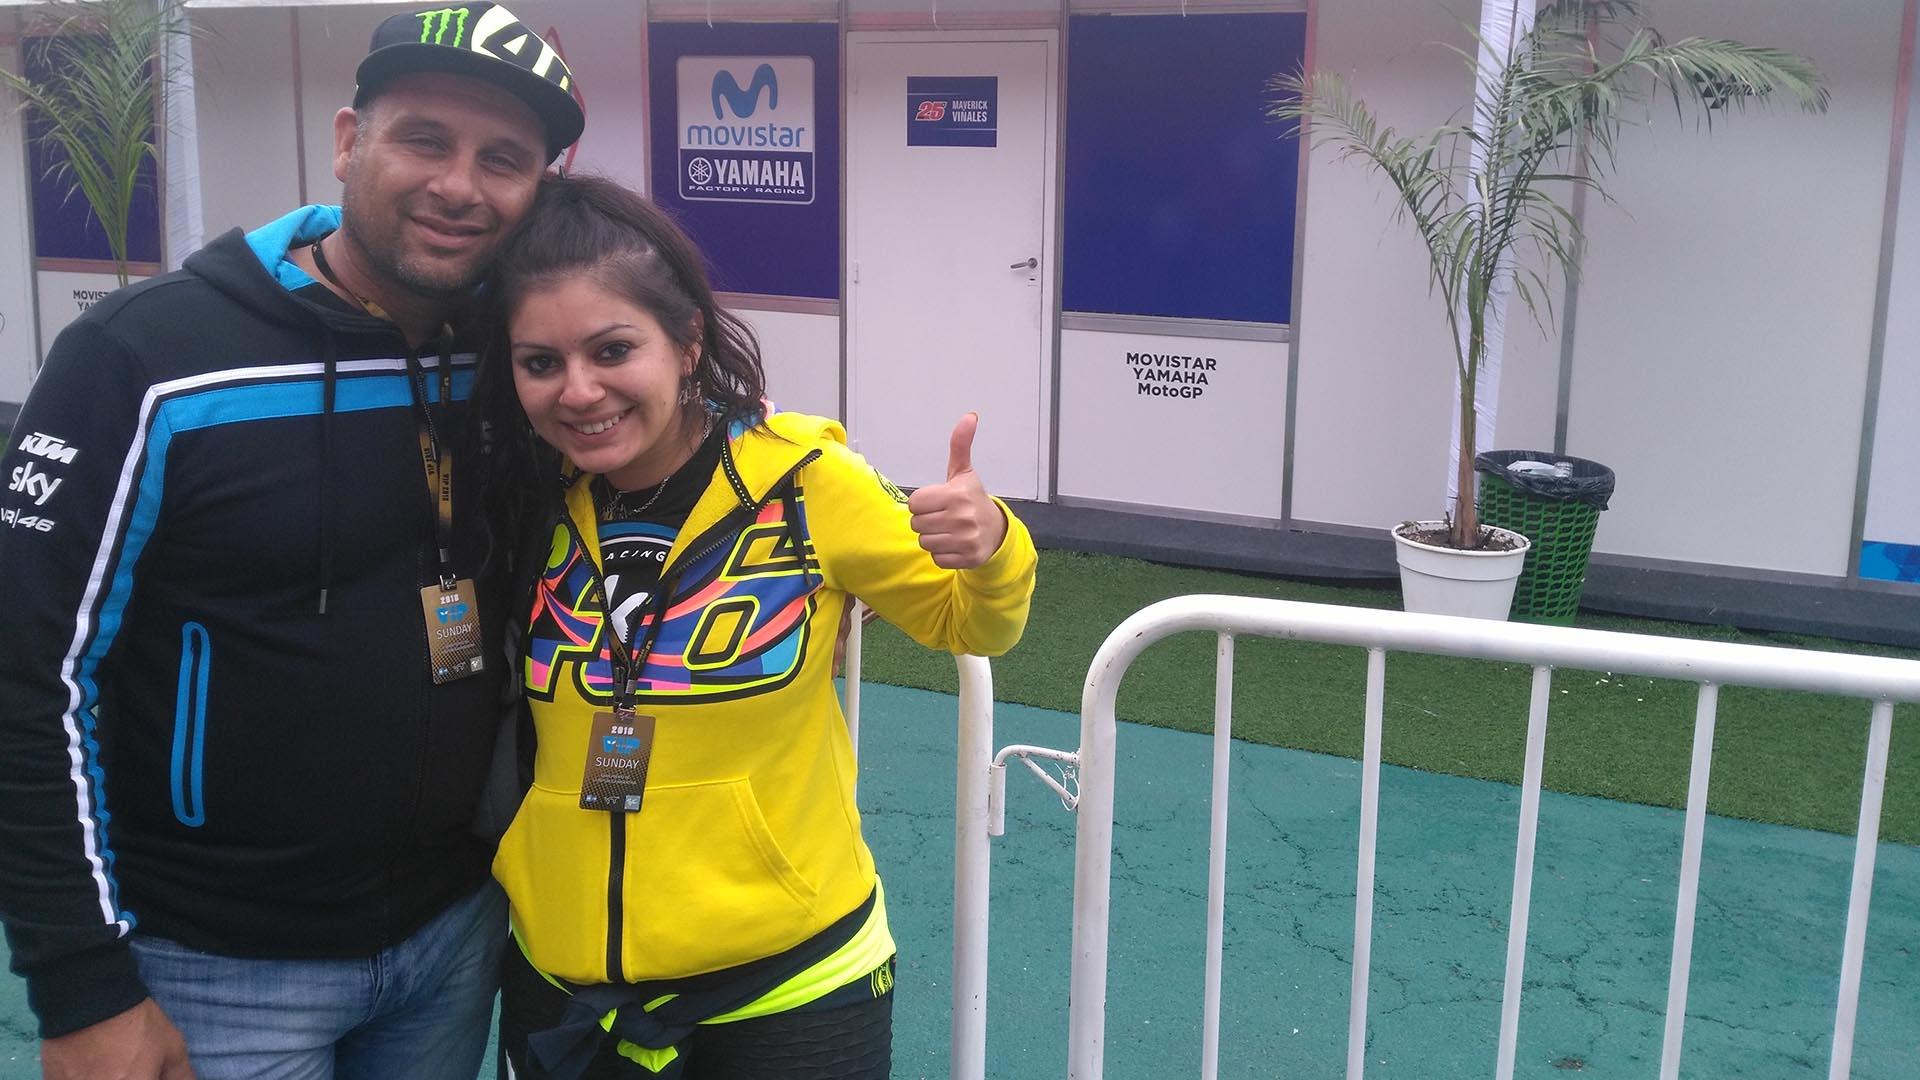 La feliz pareja aguarda el momento del reencuentro con Valentino Rossi